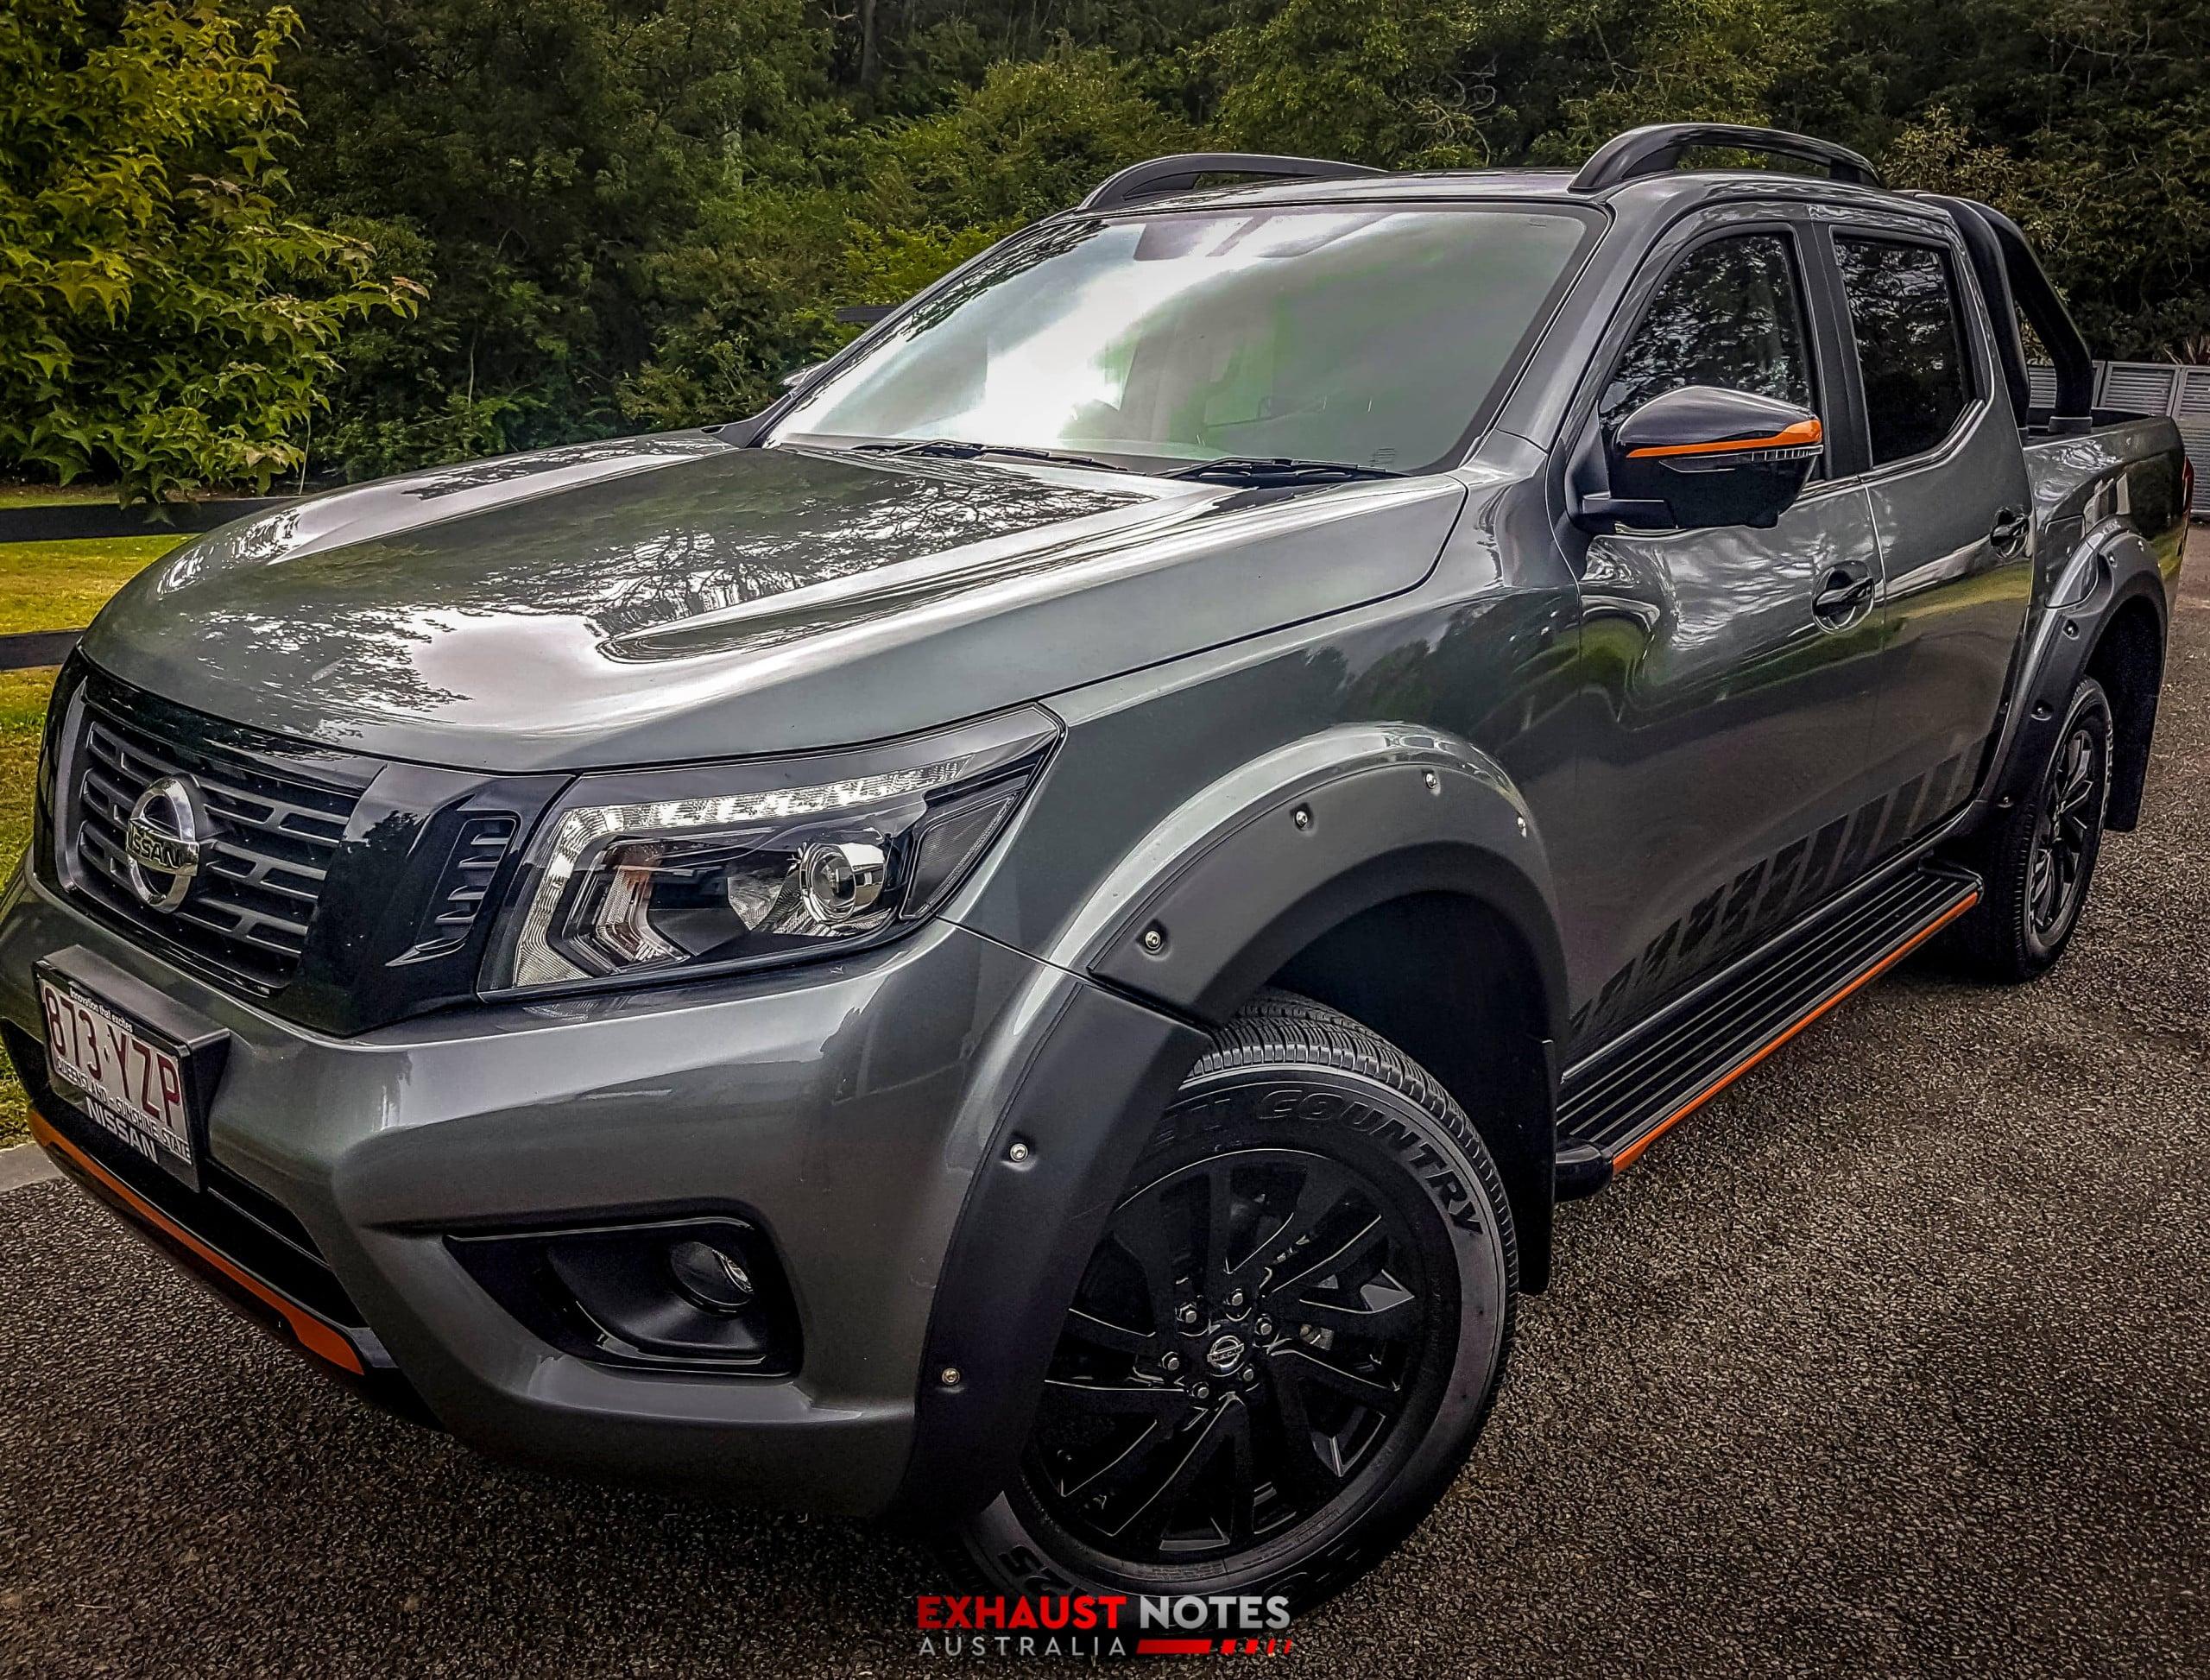 Auto Review: 2020 Nissan Navara N-TREK • Exhaust Notes ...